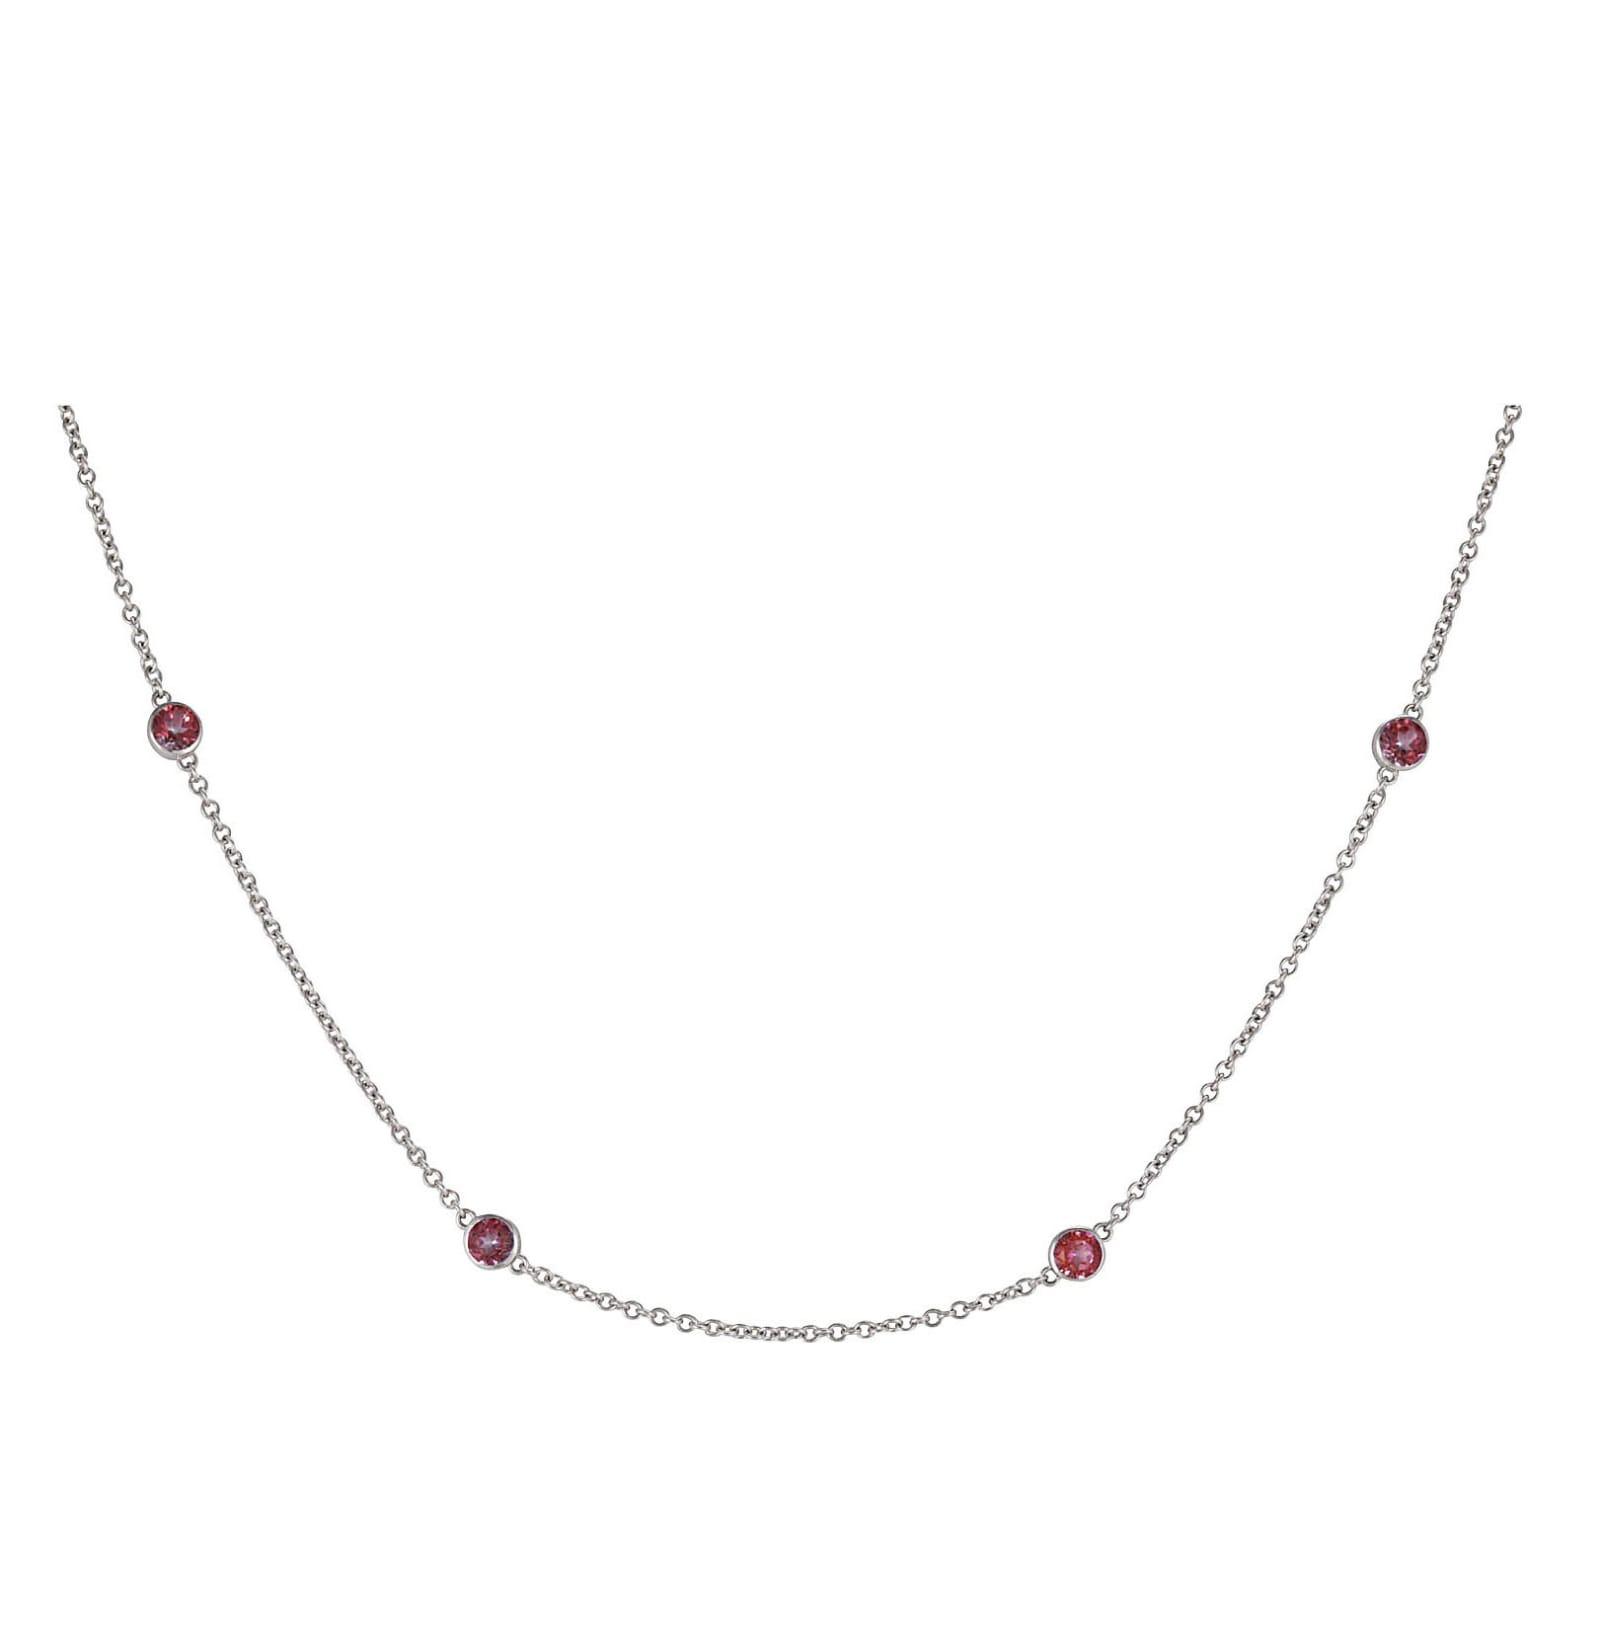 Lo Spazio Passion pink Topaz Necklace